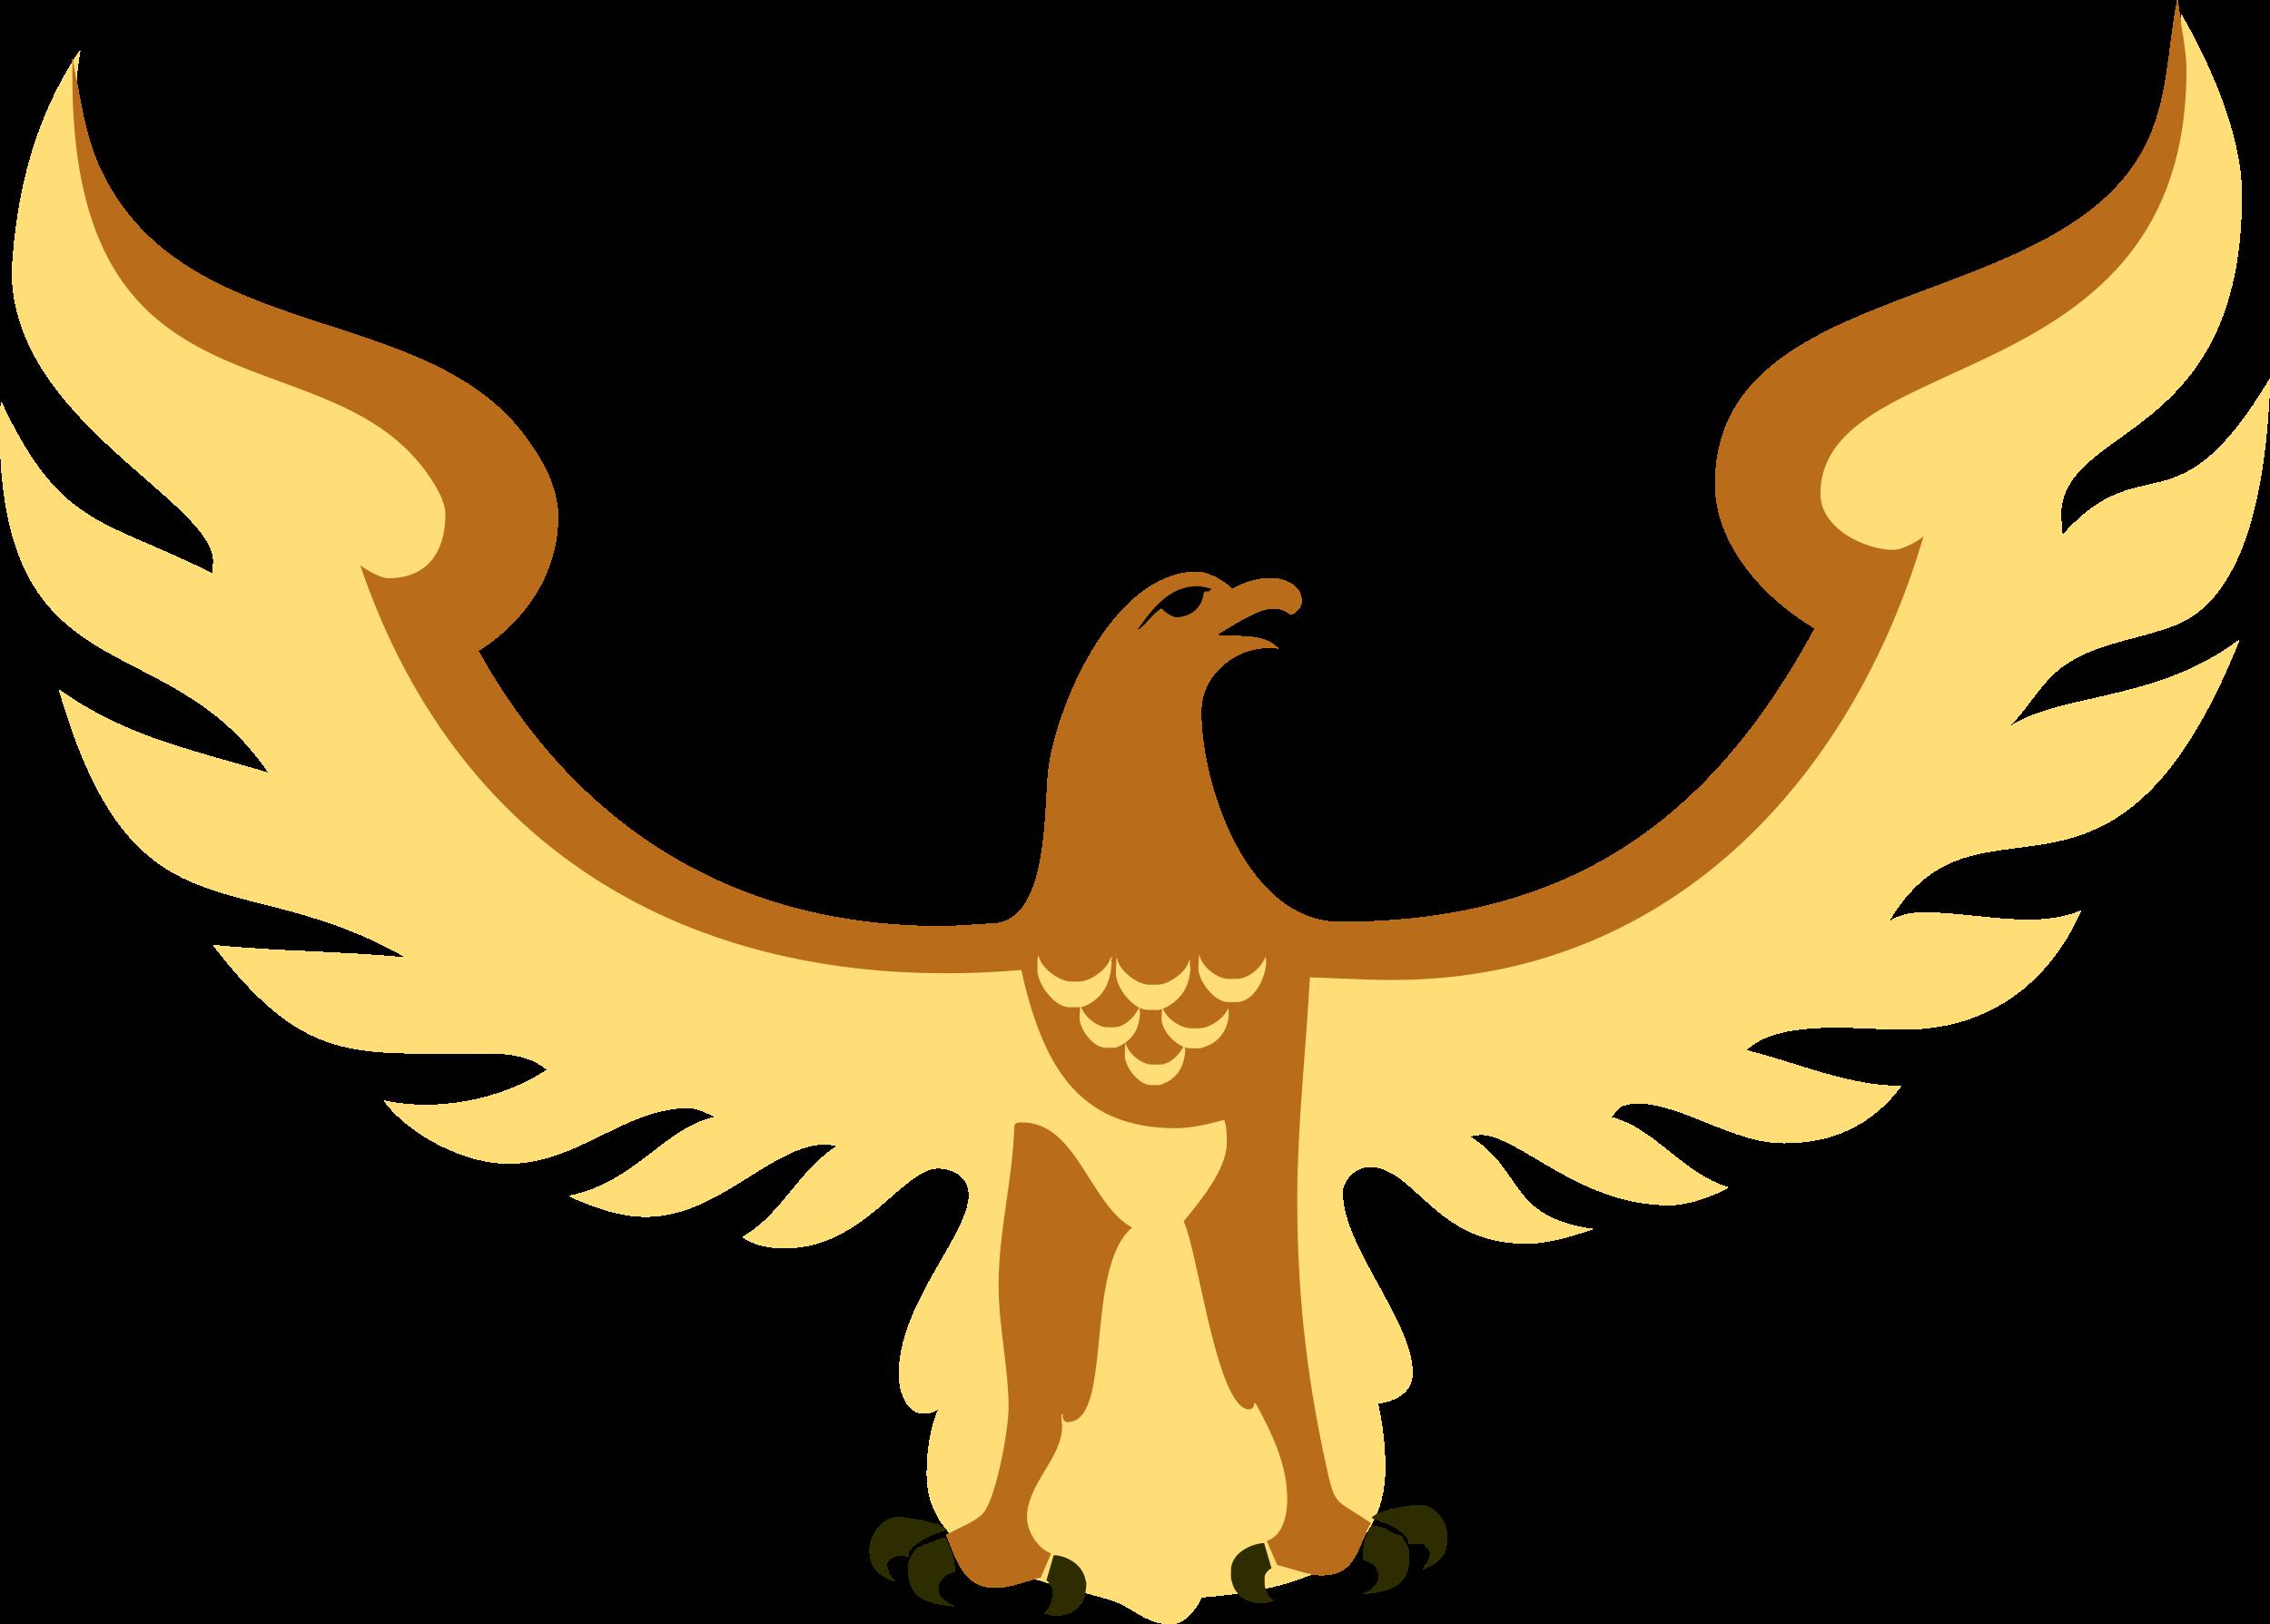 Hawk jokingart com. Falcon clipart blackhawk